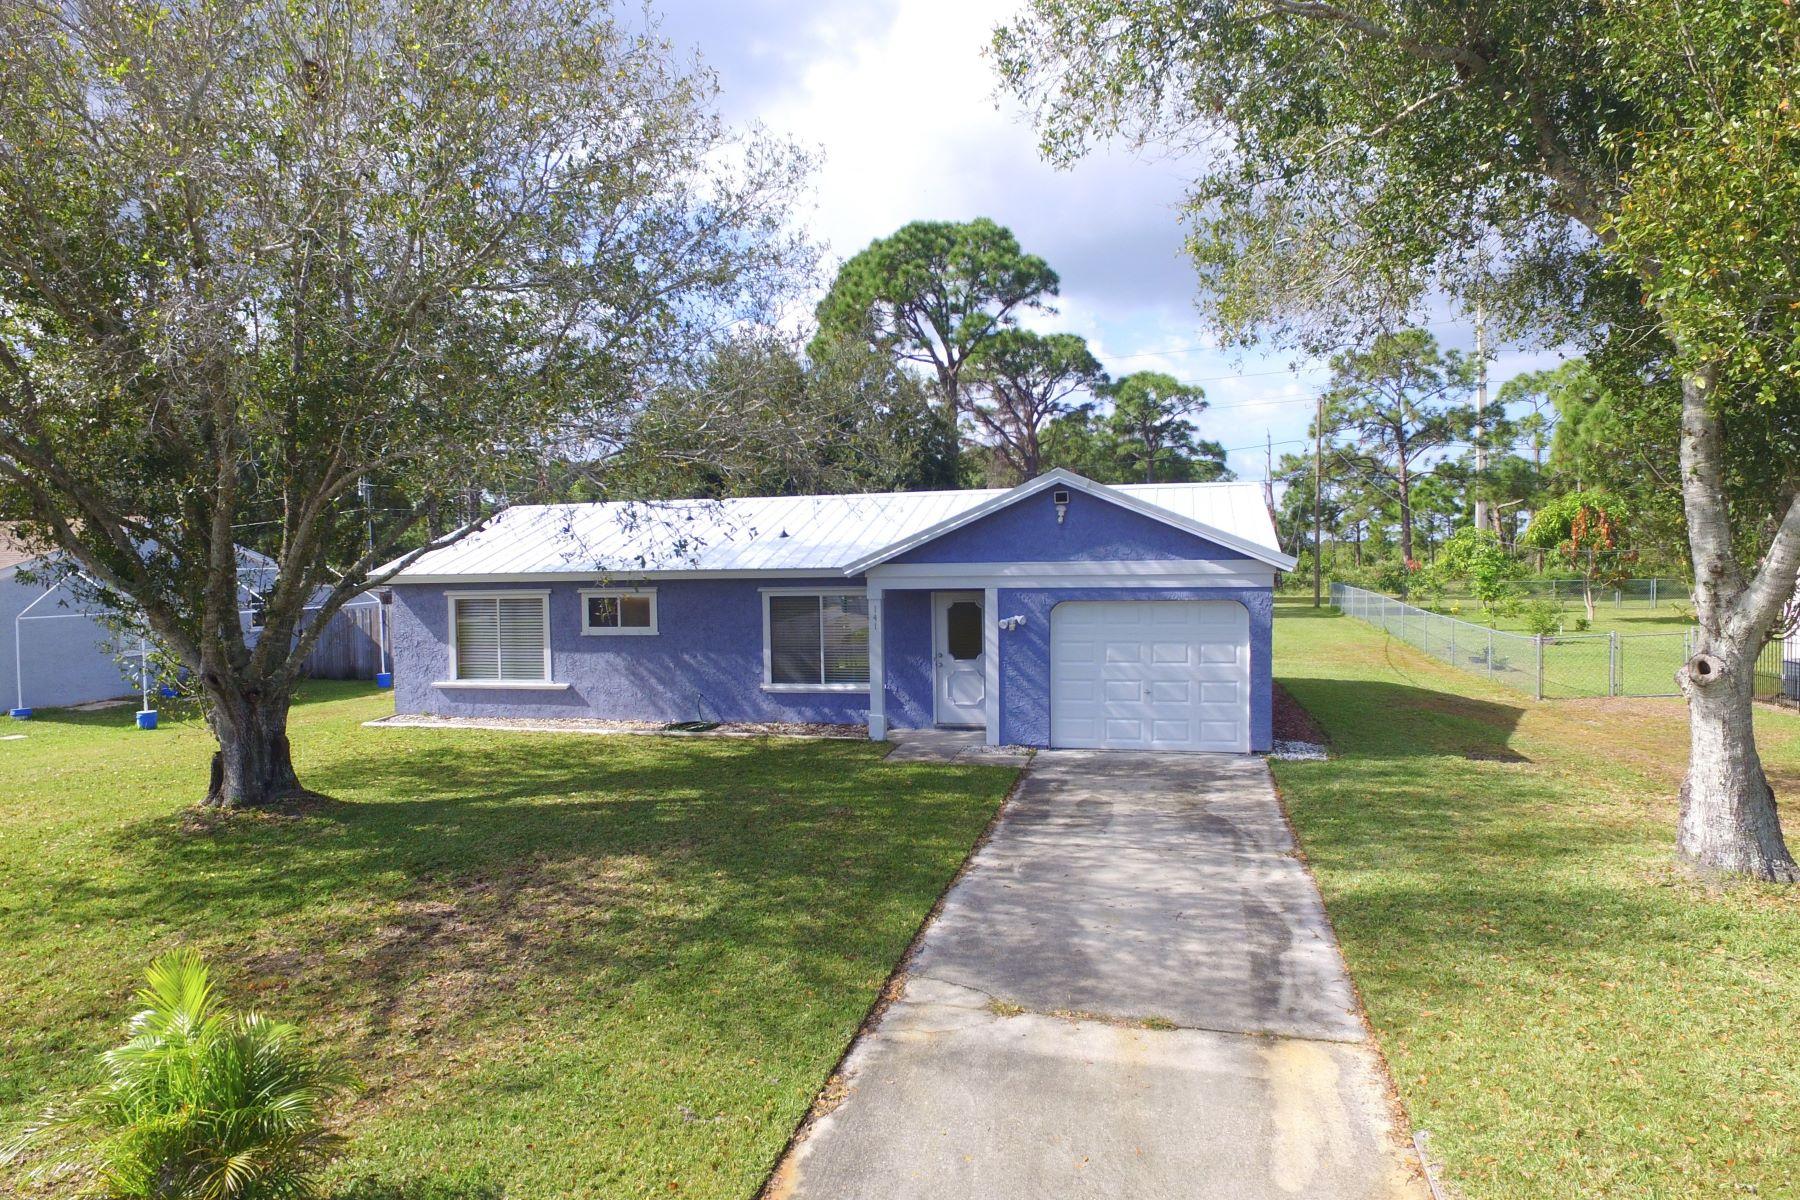 141 Caprona Street 141 Caprona Street Sebastian, Floride 32958 États-Unis